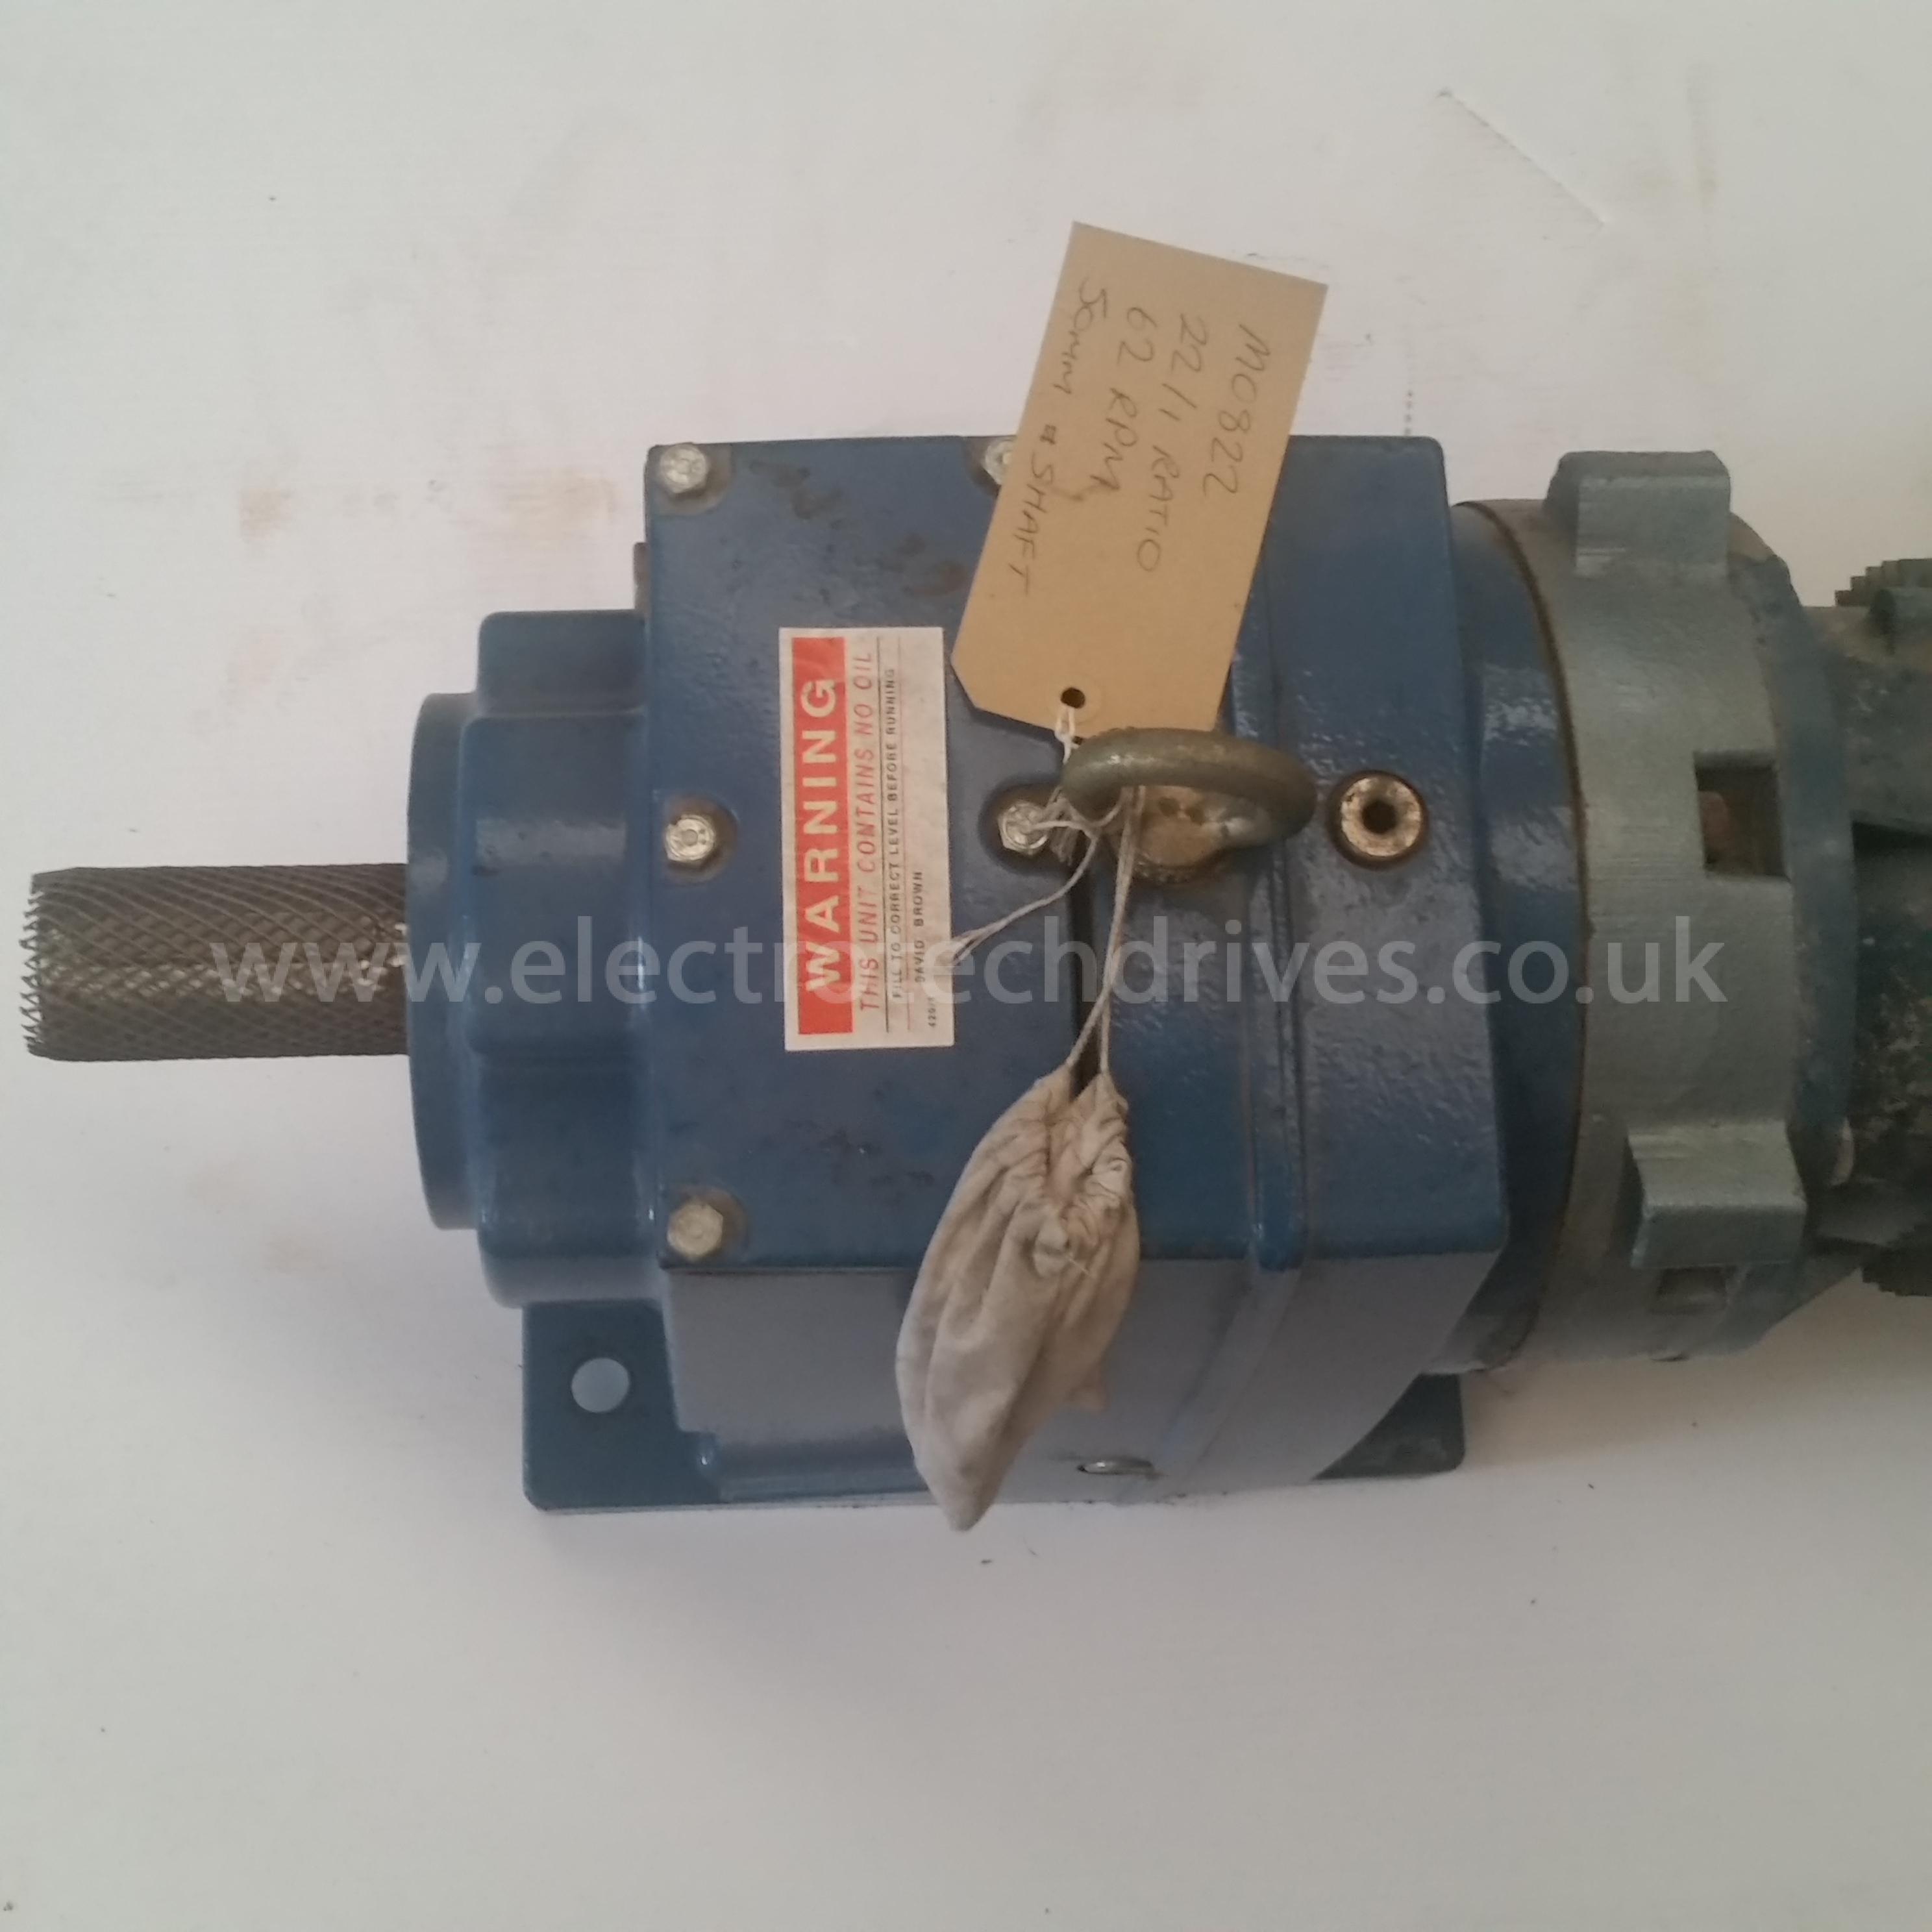 David Brown Radicon Gearbox M0822 22  1 Bgc 63rpm 50mm Shaft With 4kw 415v Motor